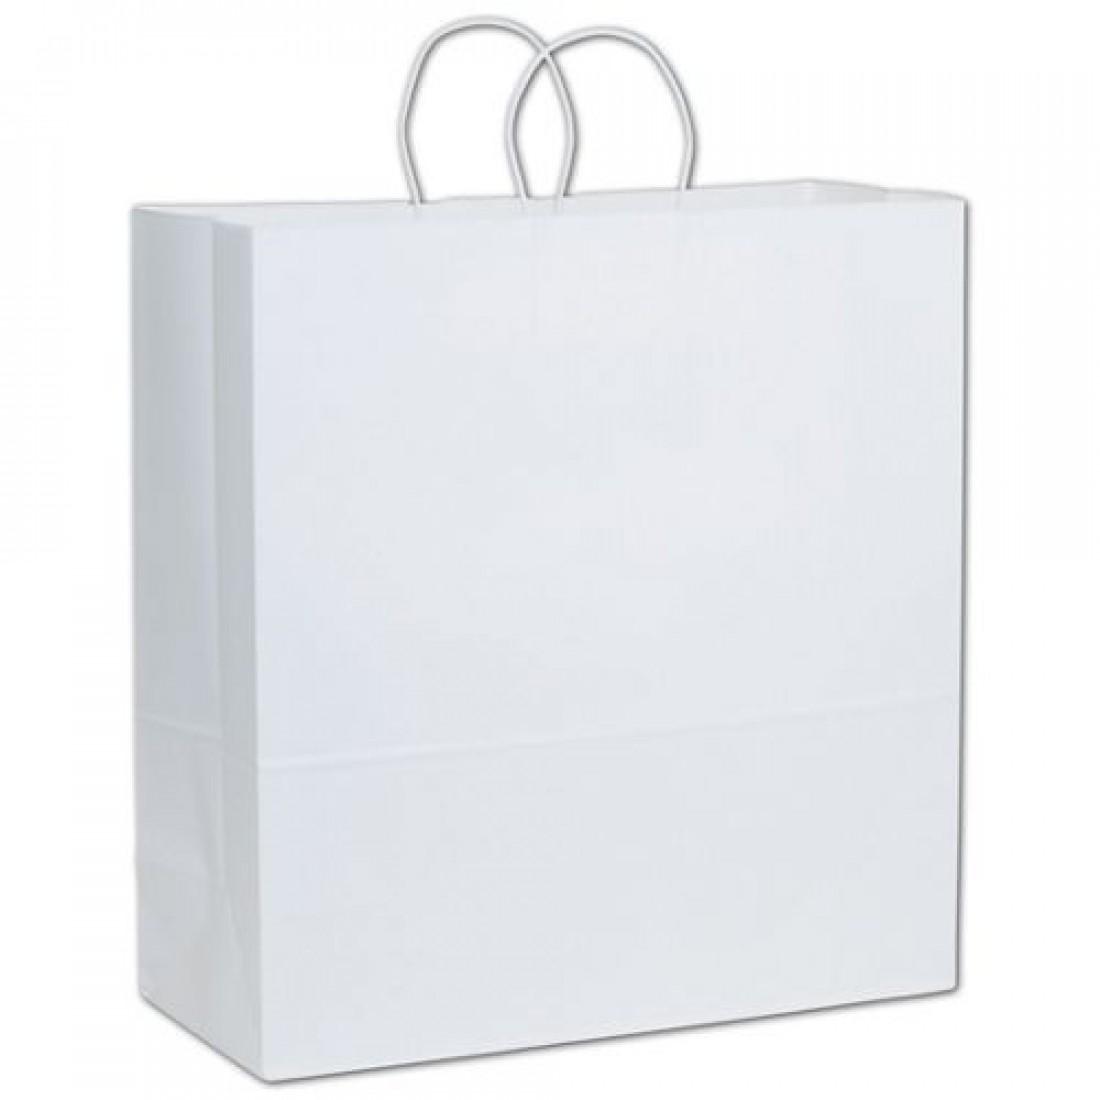 White Paper Shoppers Jumbo, 18 x 7 x 19